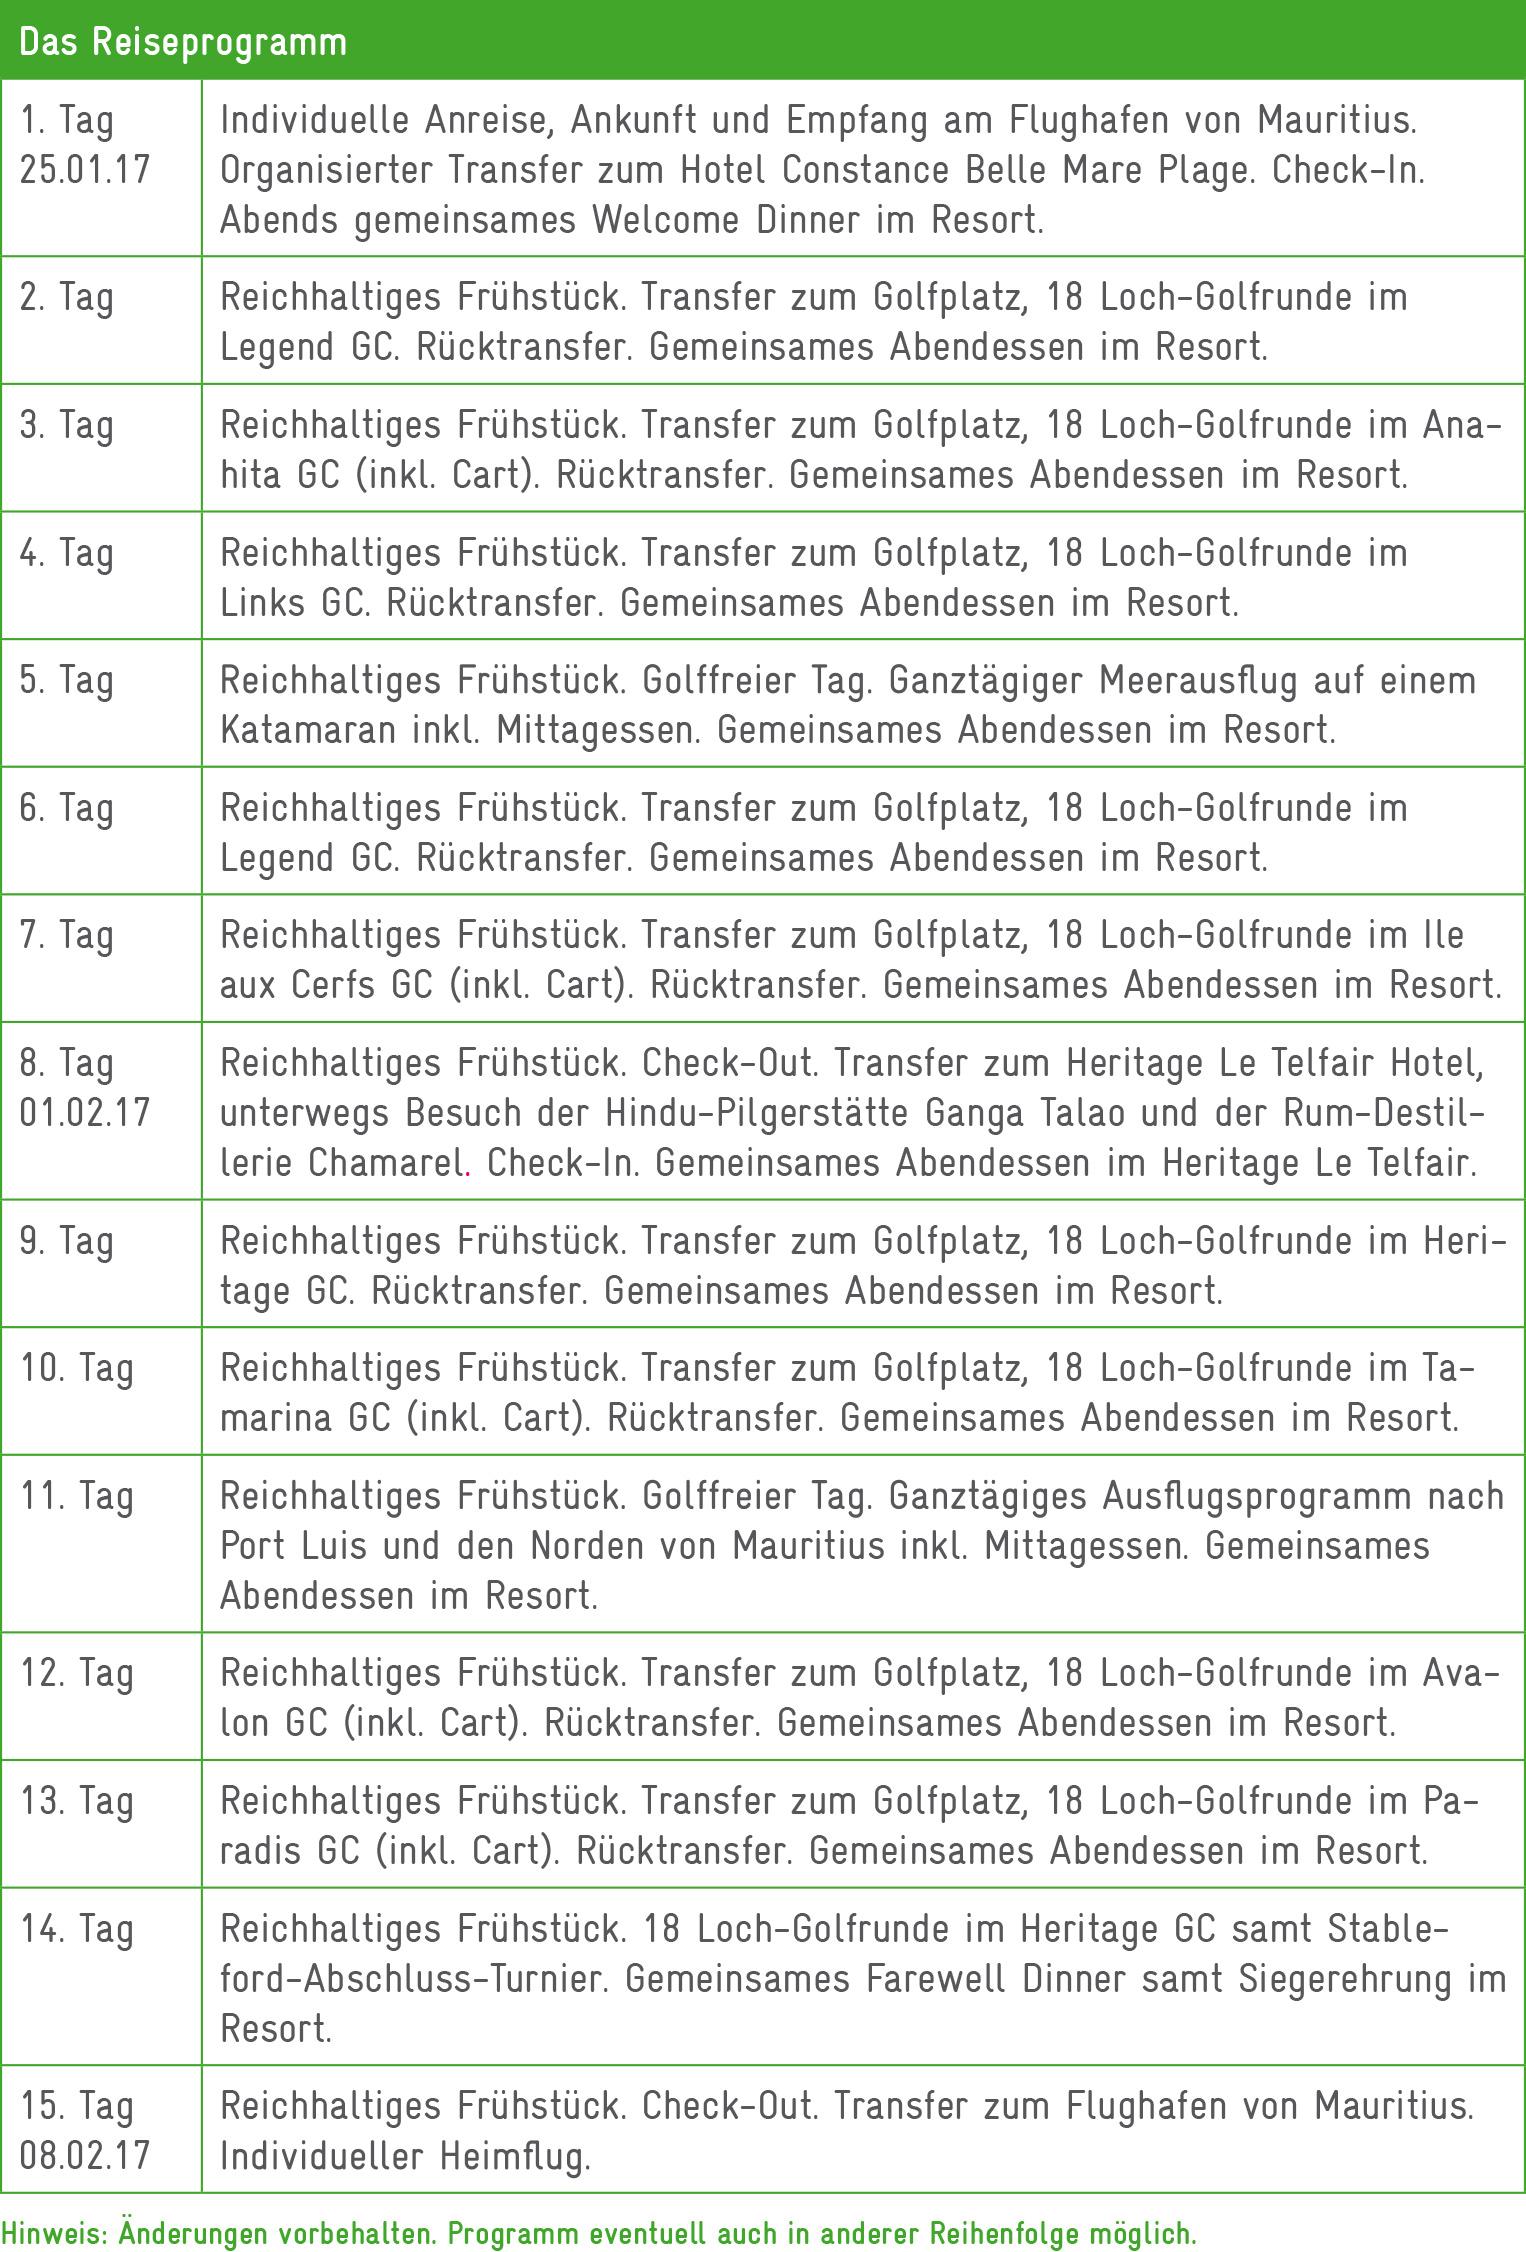 Reiseprogramm Mauritius17